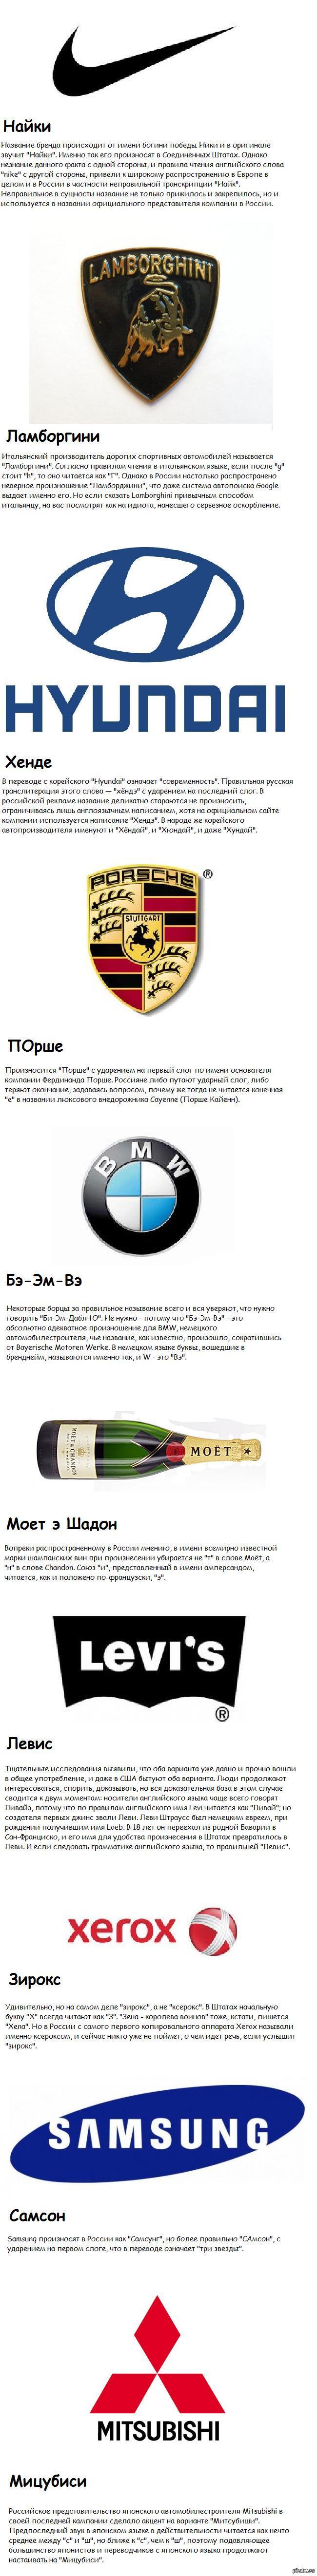 0954b33c 10 ошибок в произношении названий брендов